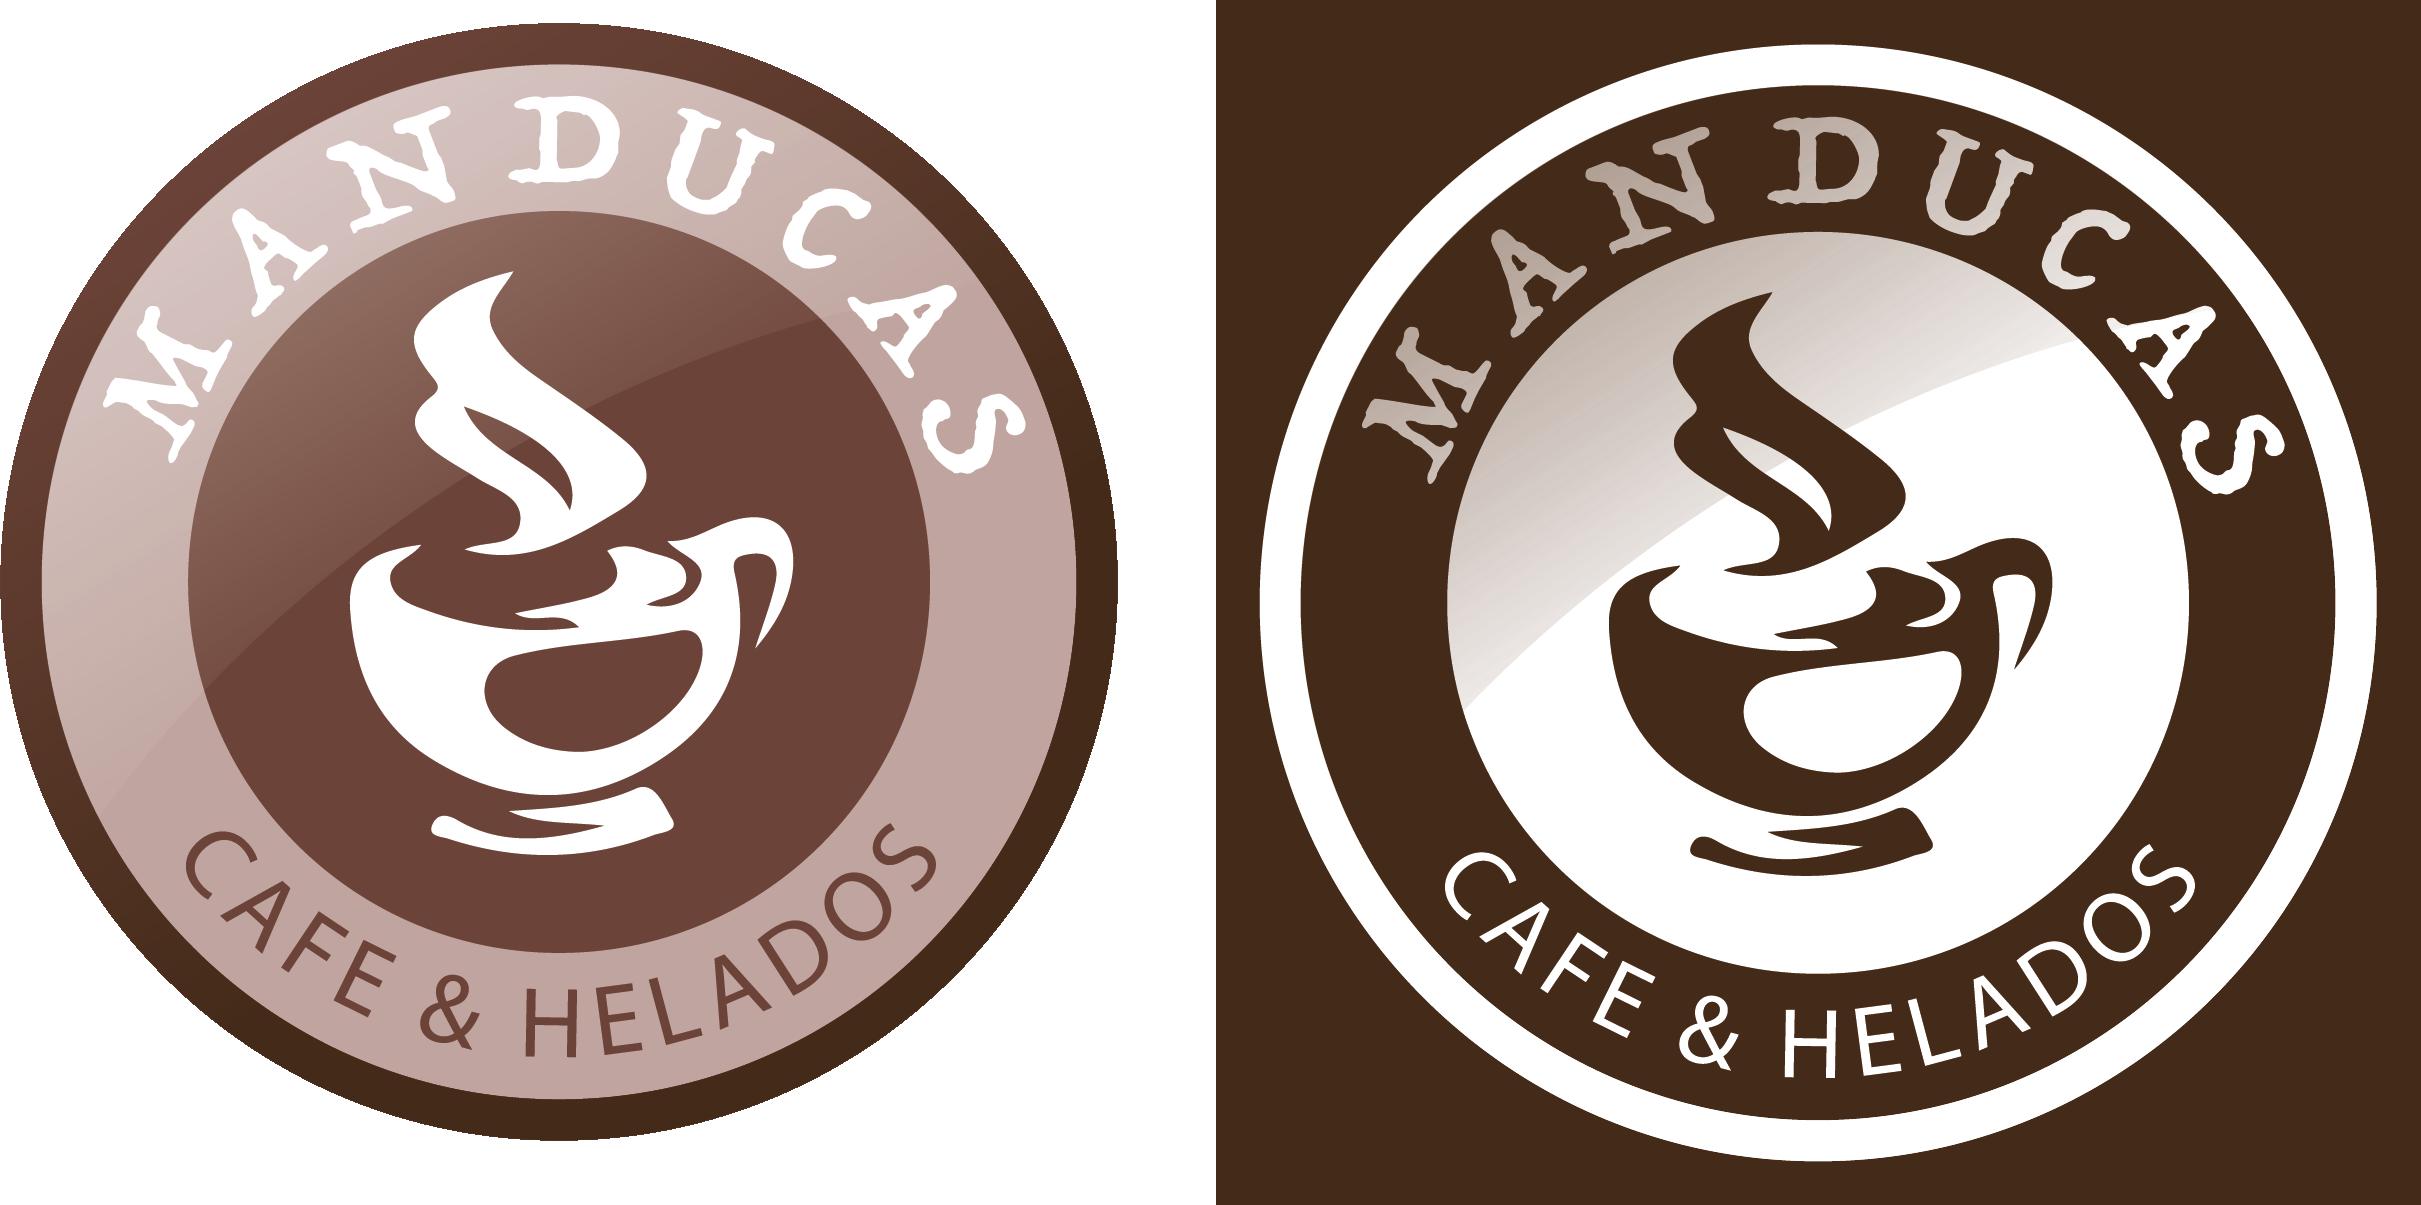 manducas logo - Cafetería Manducas